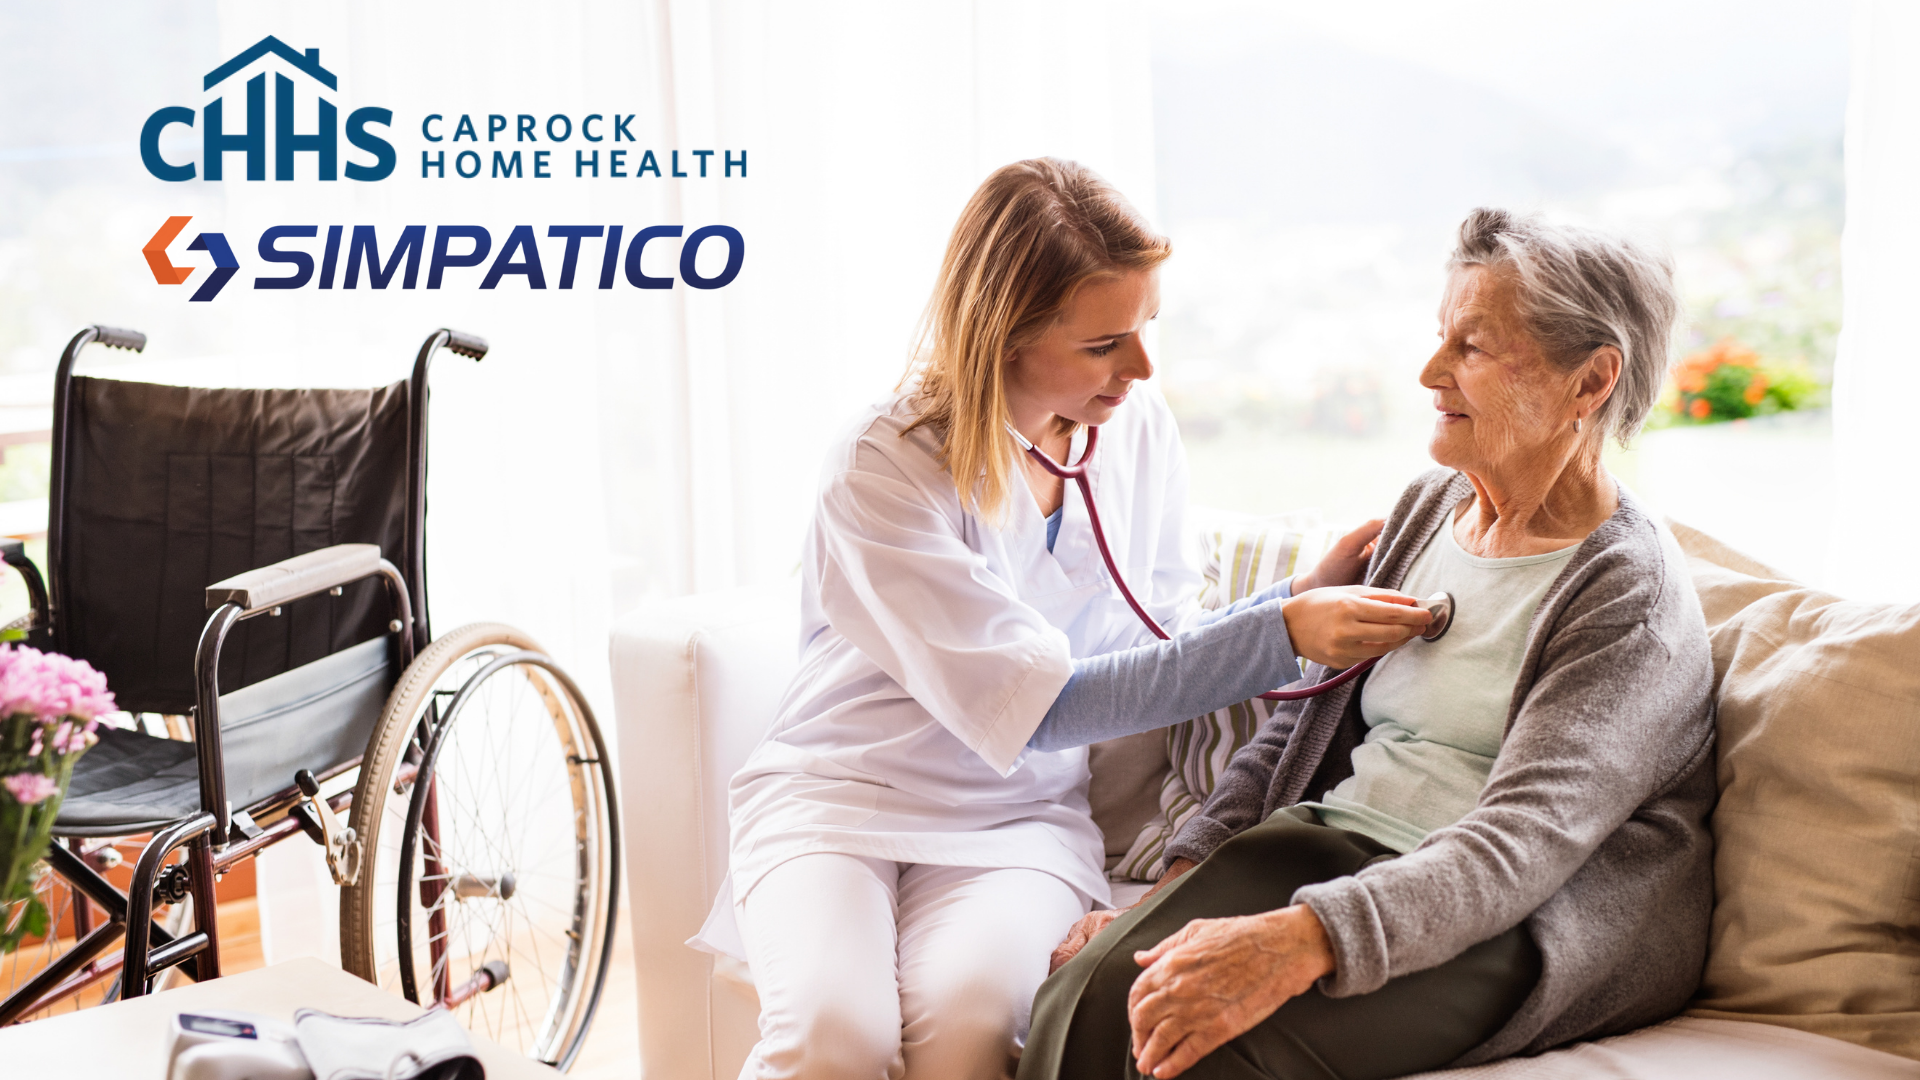 Simpatico Systems and Caprock Home Health